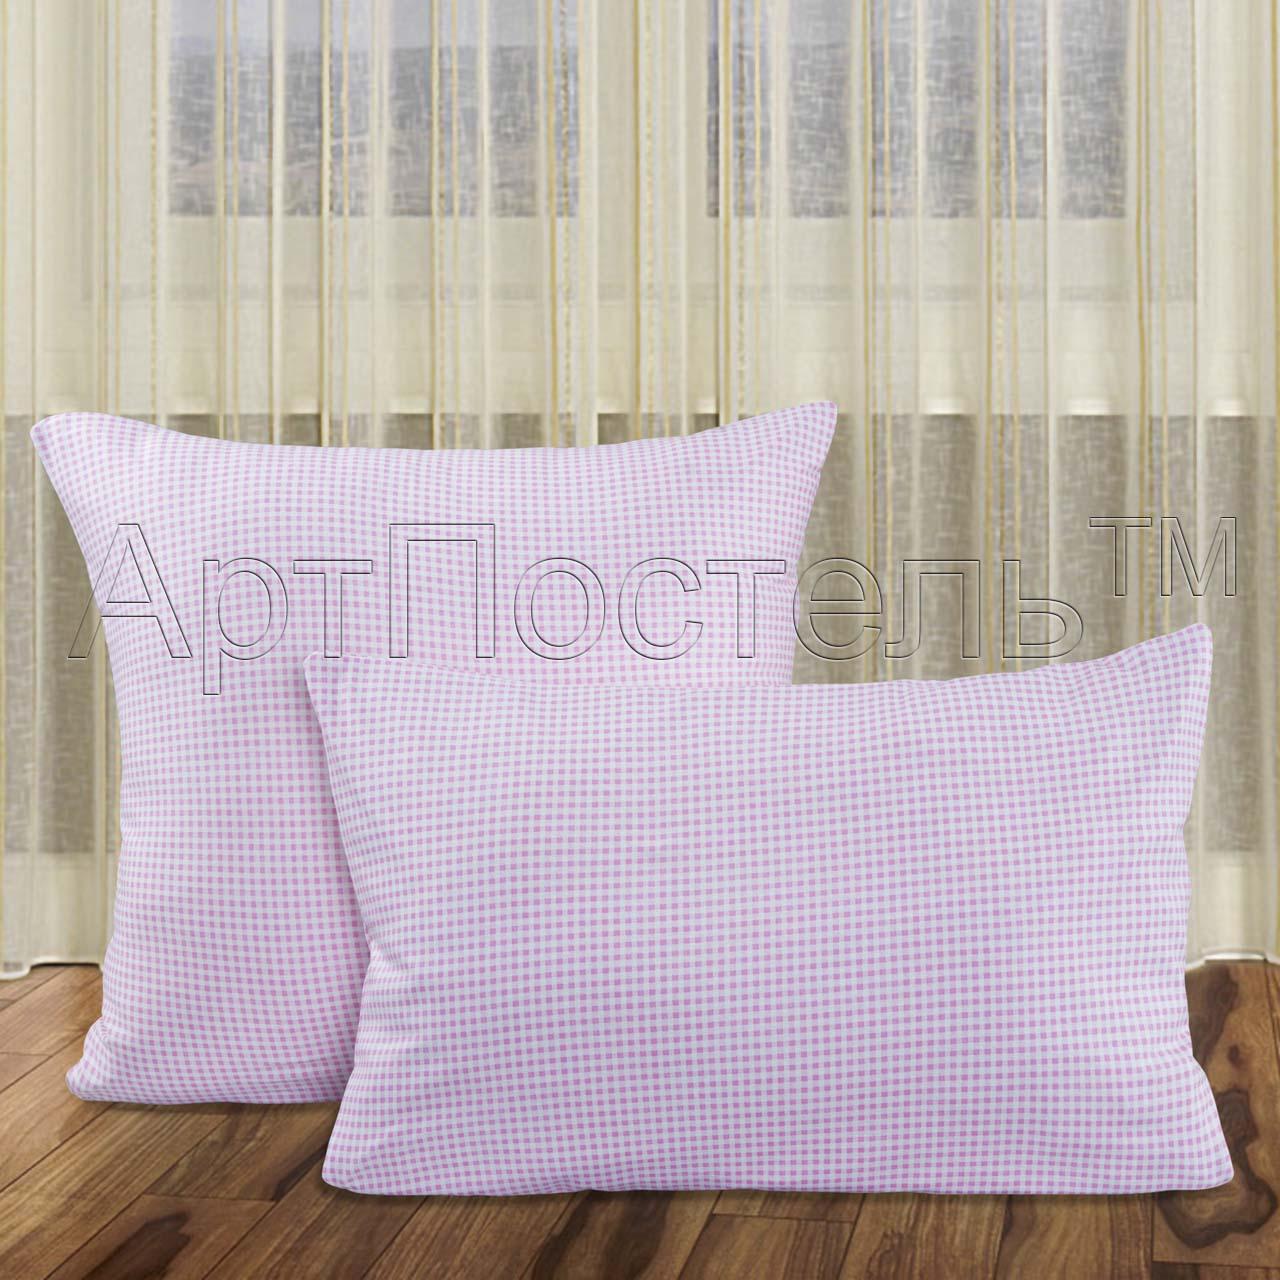 Наволочки Трикотажные Клетка Розовый р. 70х70Наволочки<br>Плотность ткани: 140 г/кв. м <br>Количество: 2 шт.<br><br>Тип: Наволочки<br>Размер: 70х70<br>Материал: Кулирка